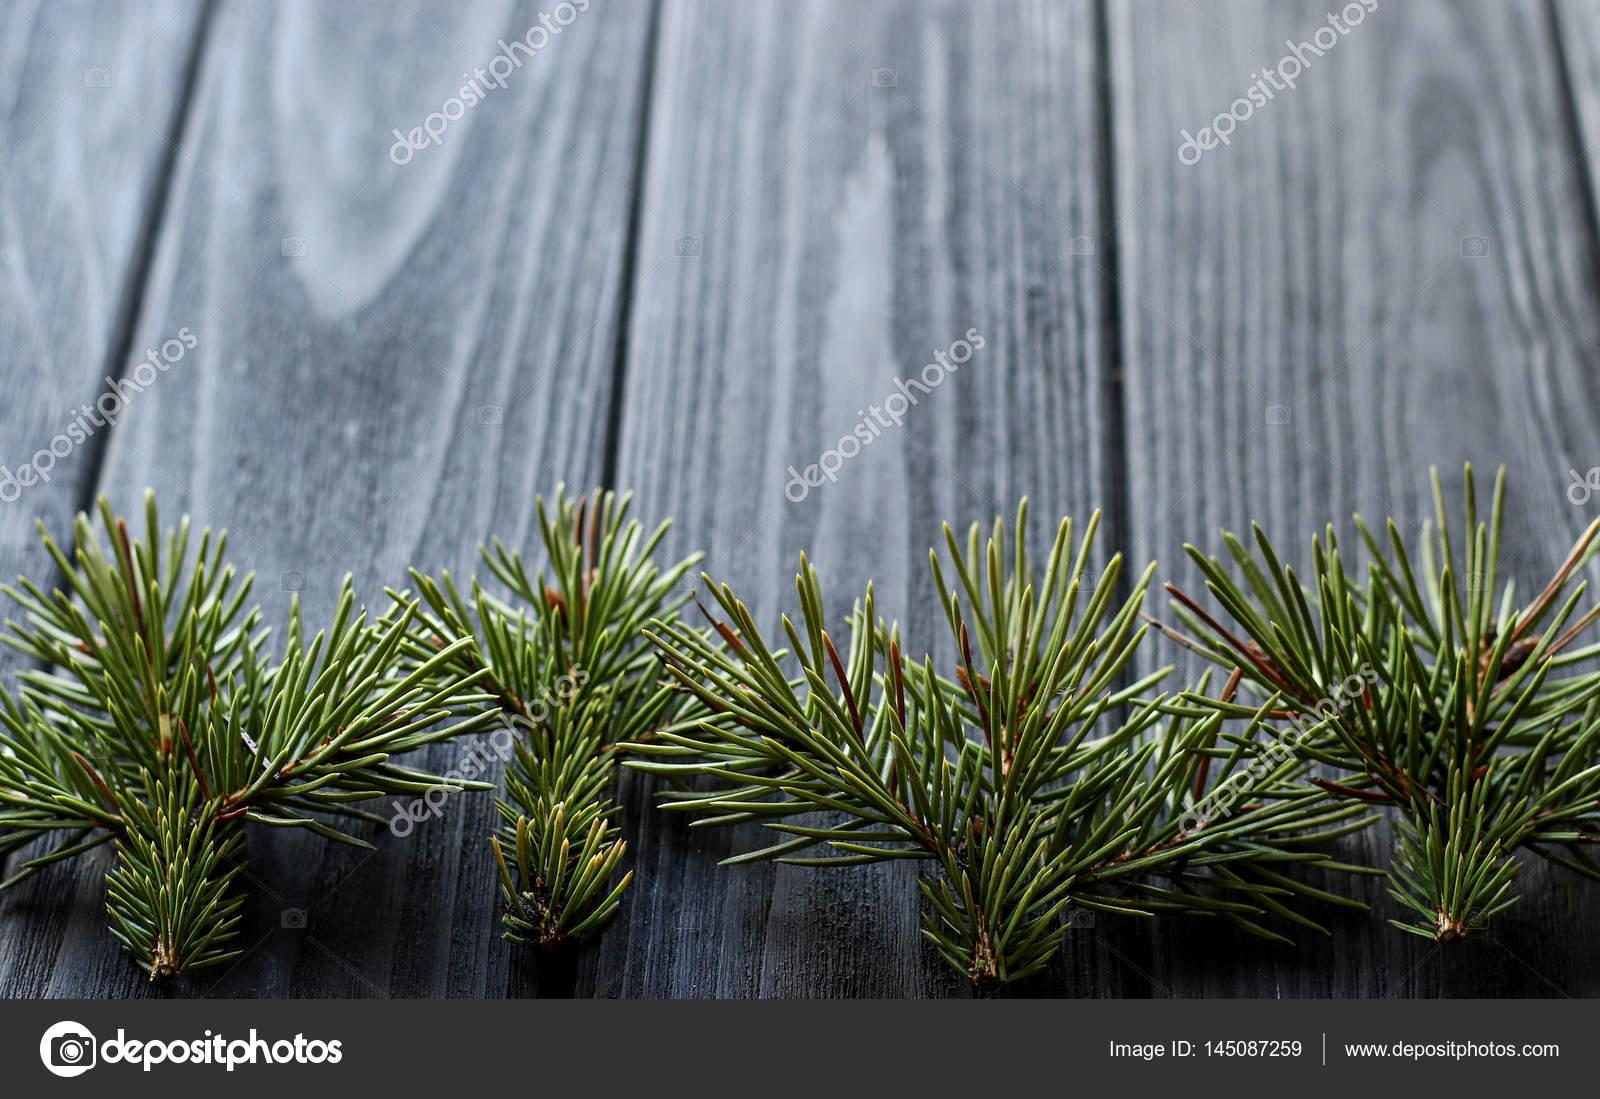 https://st3.depositphotos.com/4018499/14508/i/1600/depositphotos_145087259-stockafbeelding-kamer-interieur-met-bos-takken.jpg